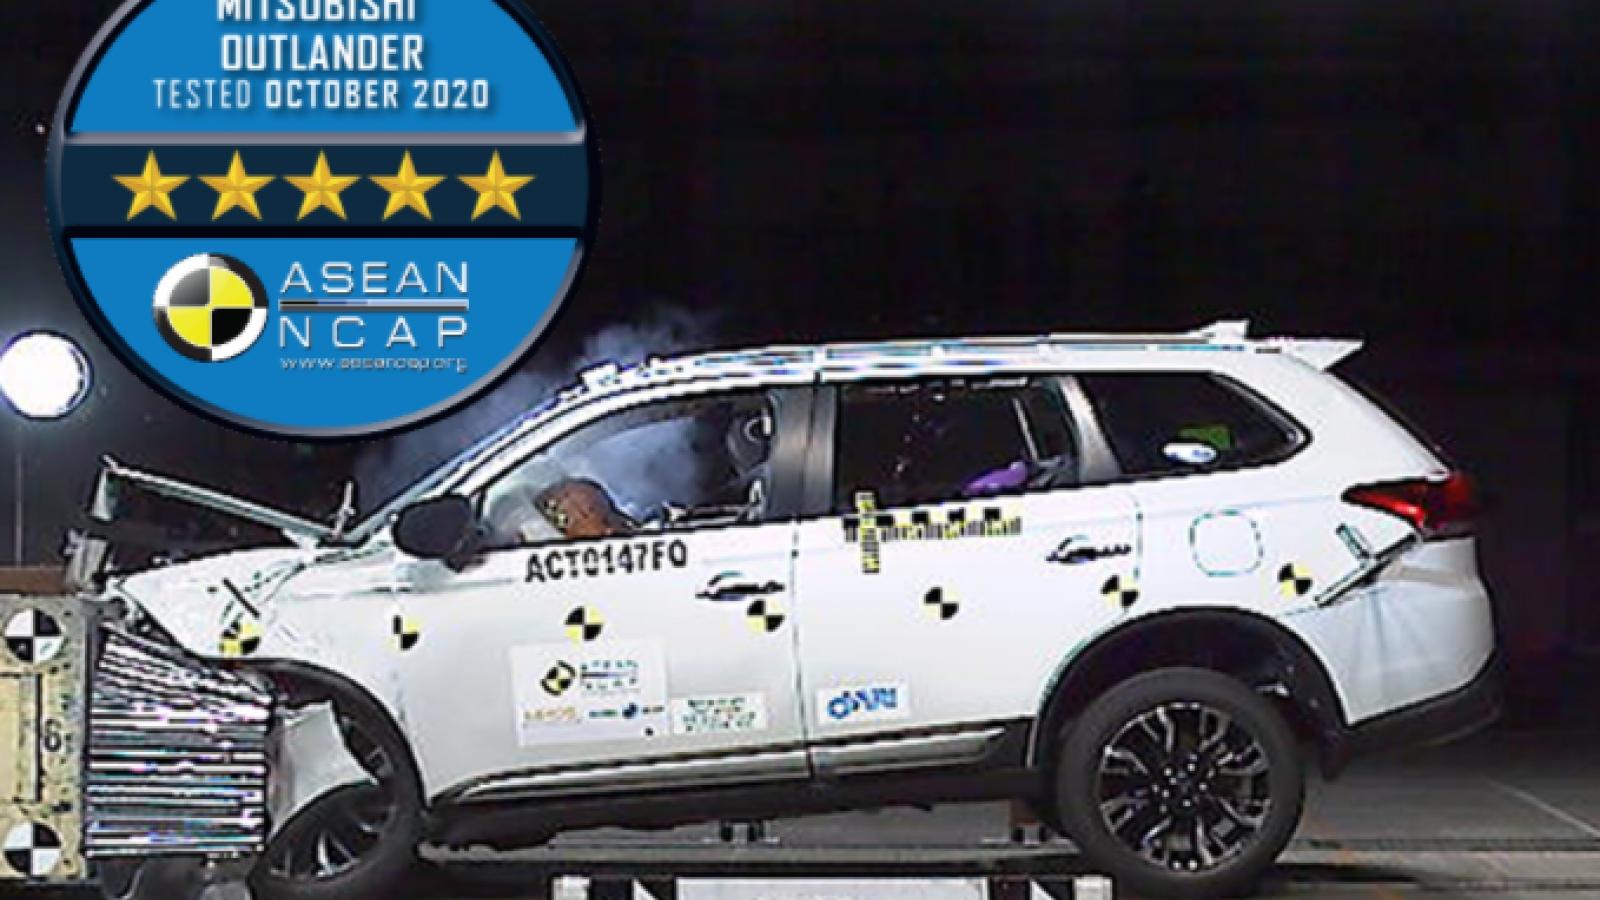 Mitsubishi Outlander lắp tại Việt Nam đạt 5 sao bài kiểm tra an toàn ASEAN NCAP